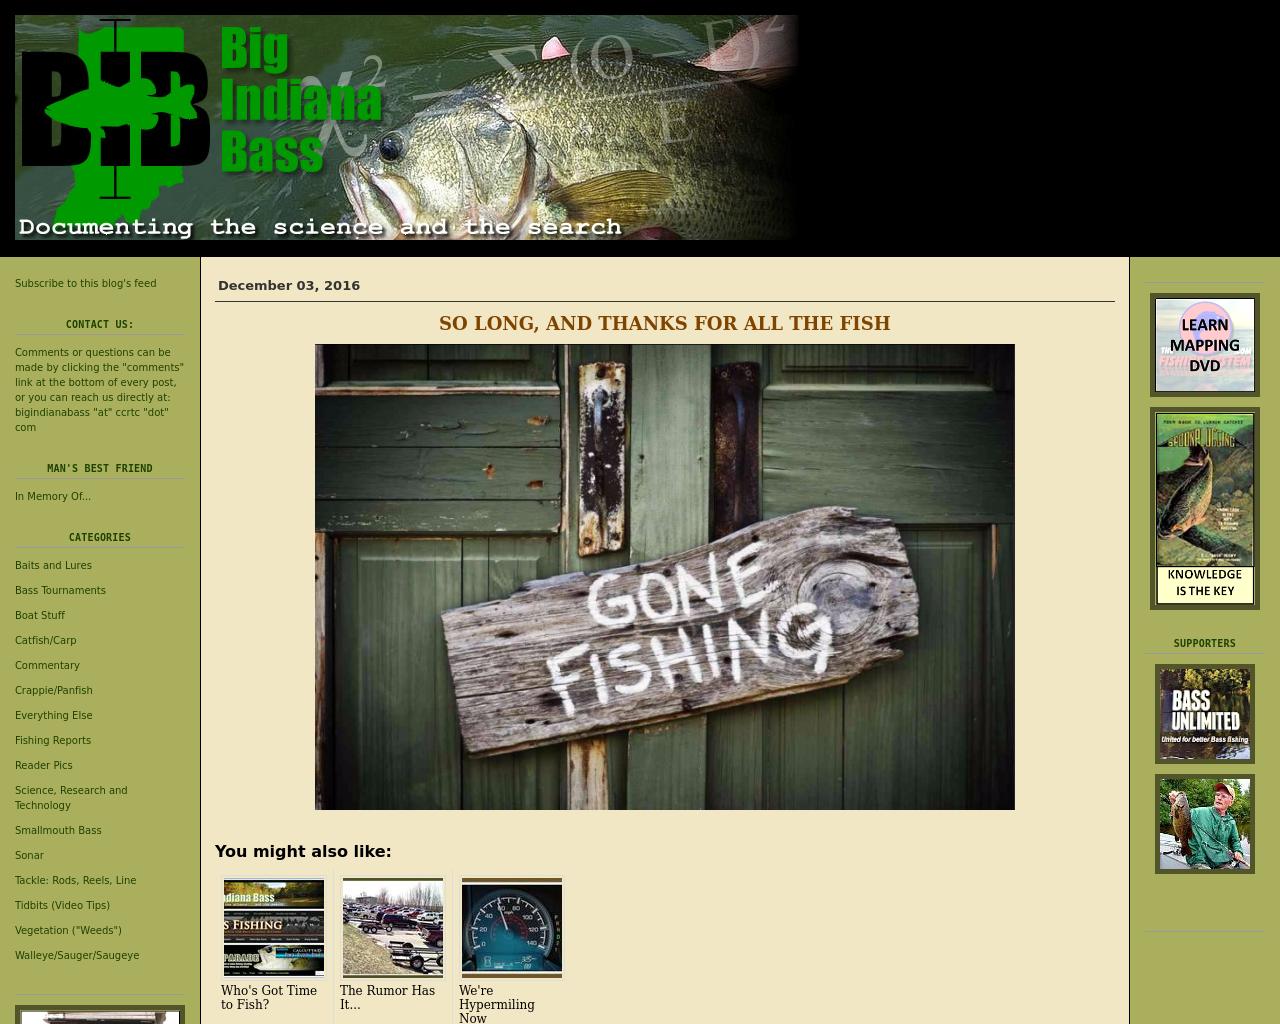 Big-Indiana-Bass-Advertising-Reviews-Pricing